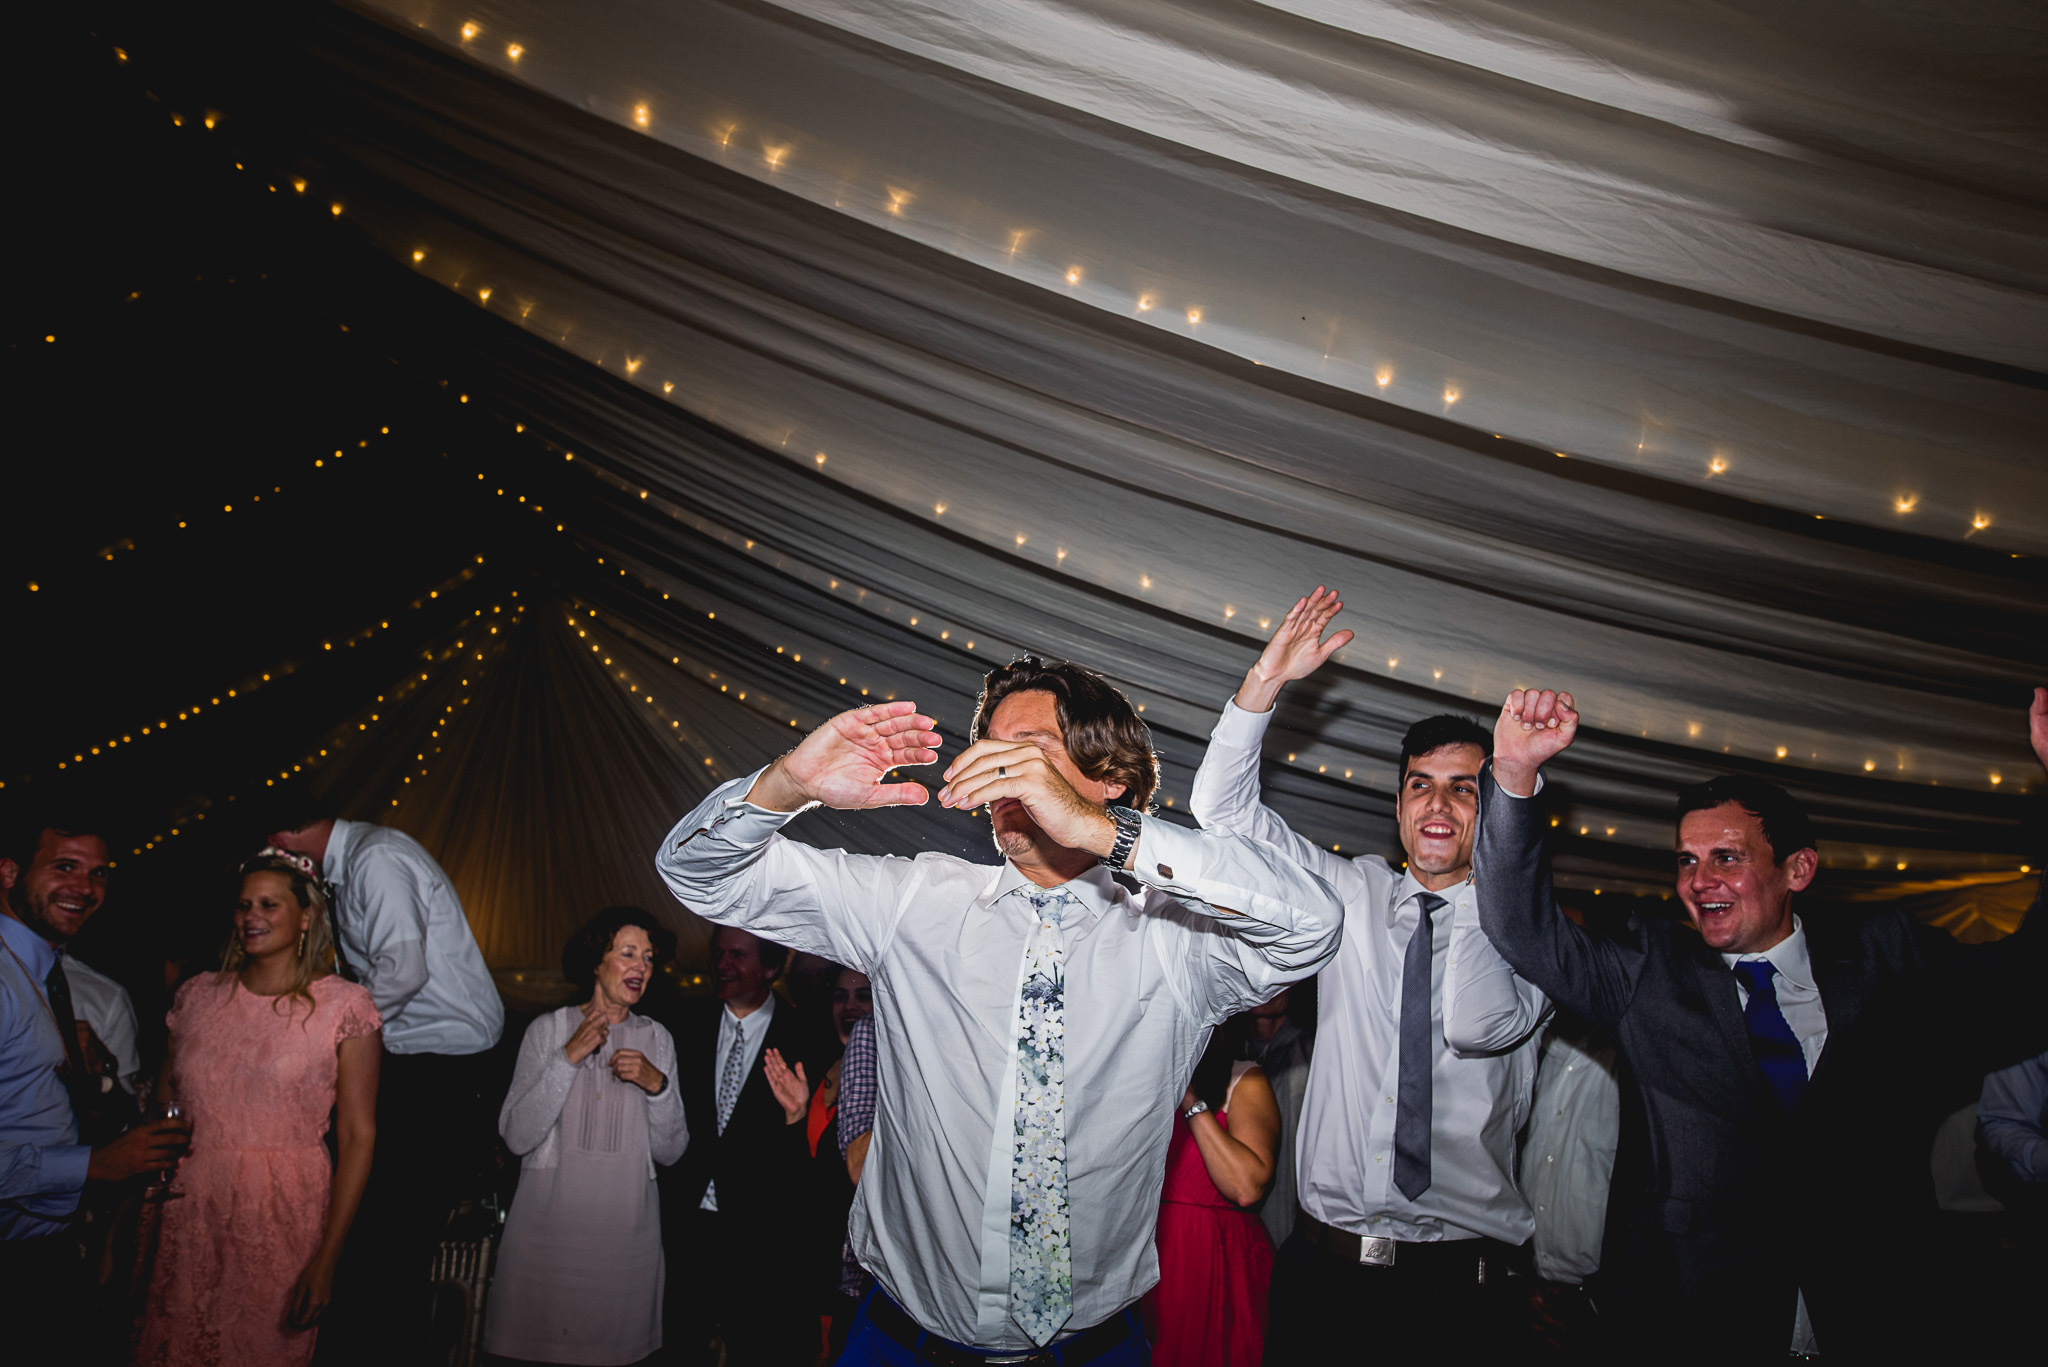 Lara & Jack Wedding 220815 by Barney Walters_1042_BW2_0925